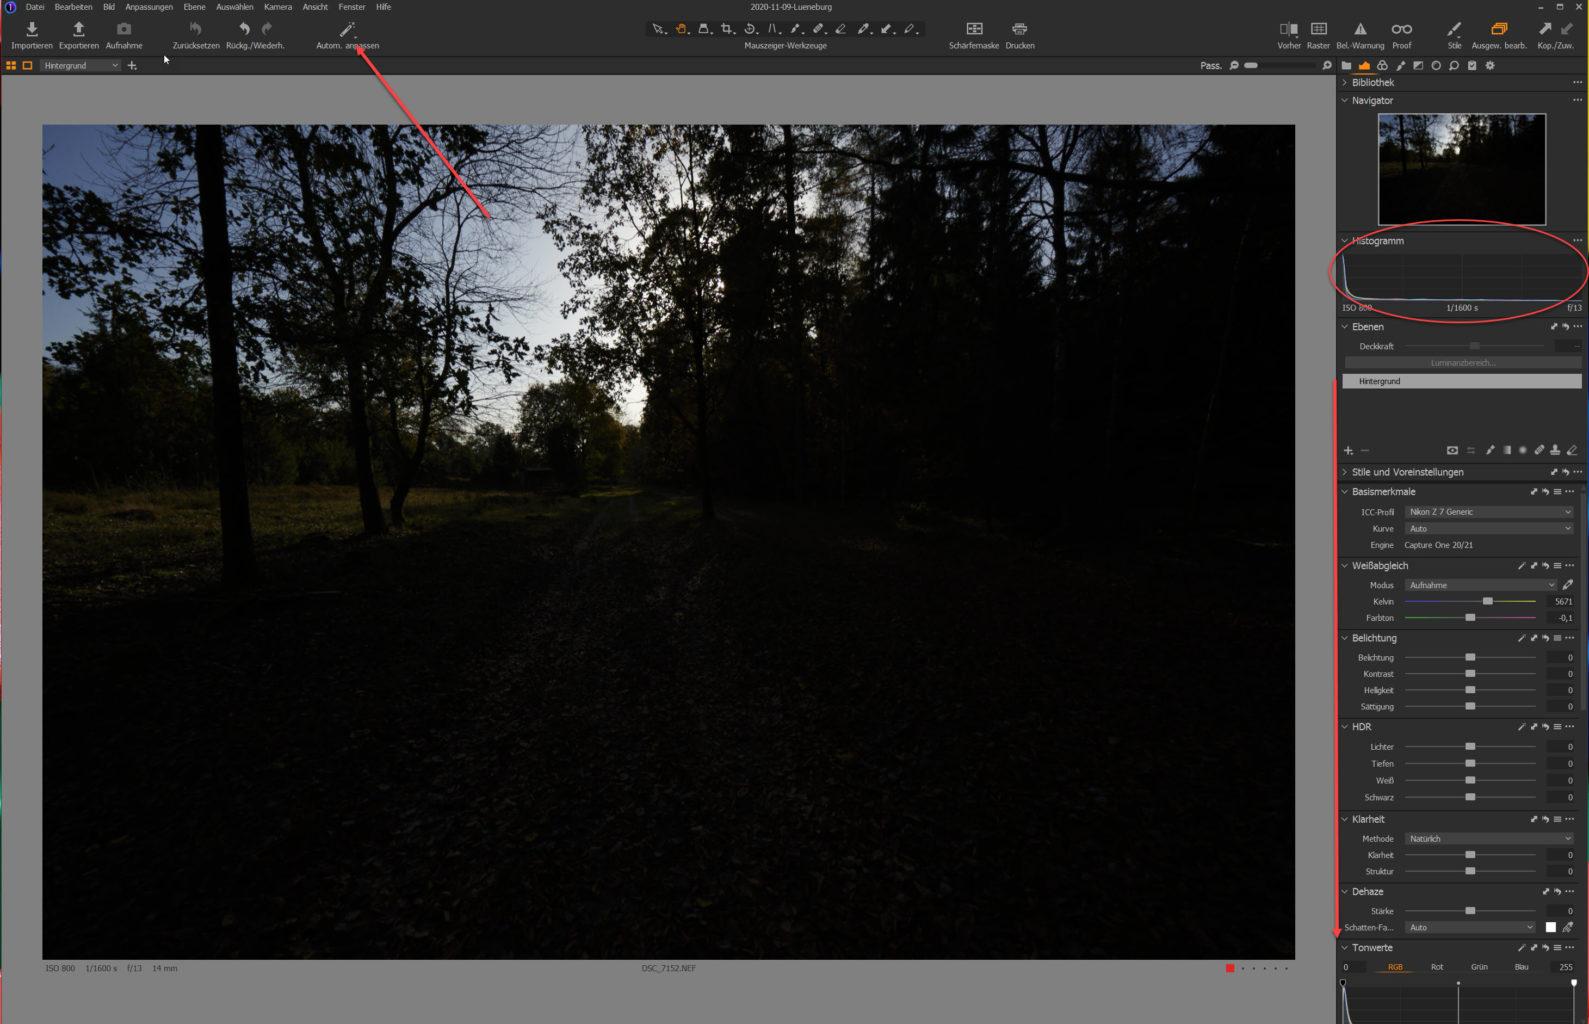 Screenshot, Capture One, Bildentwicklung